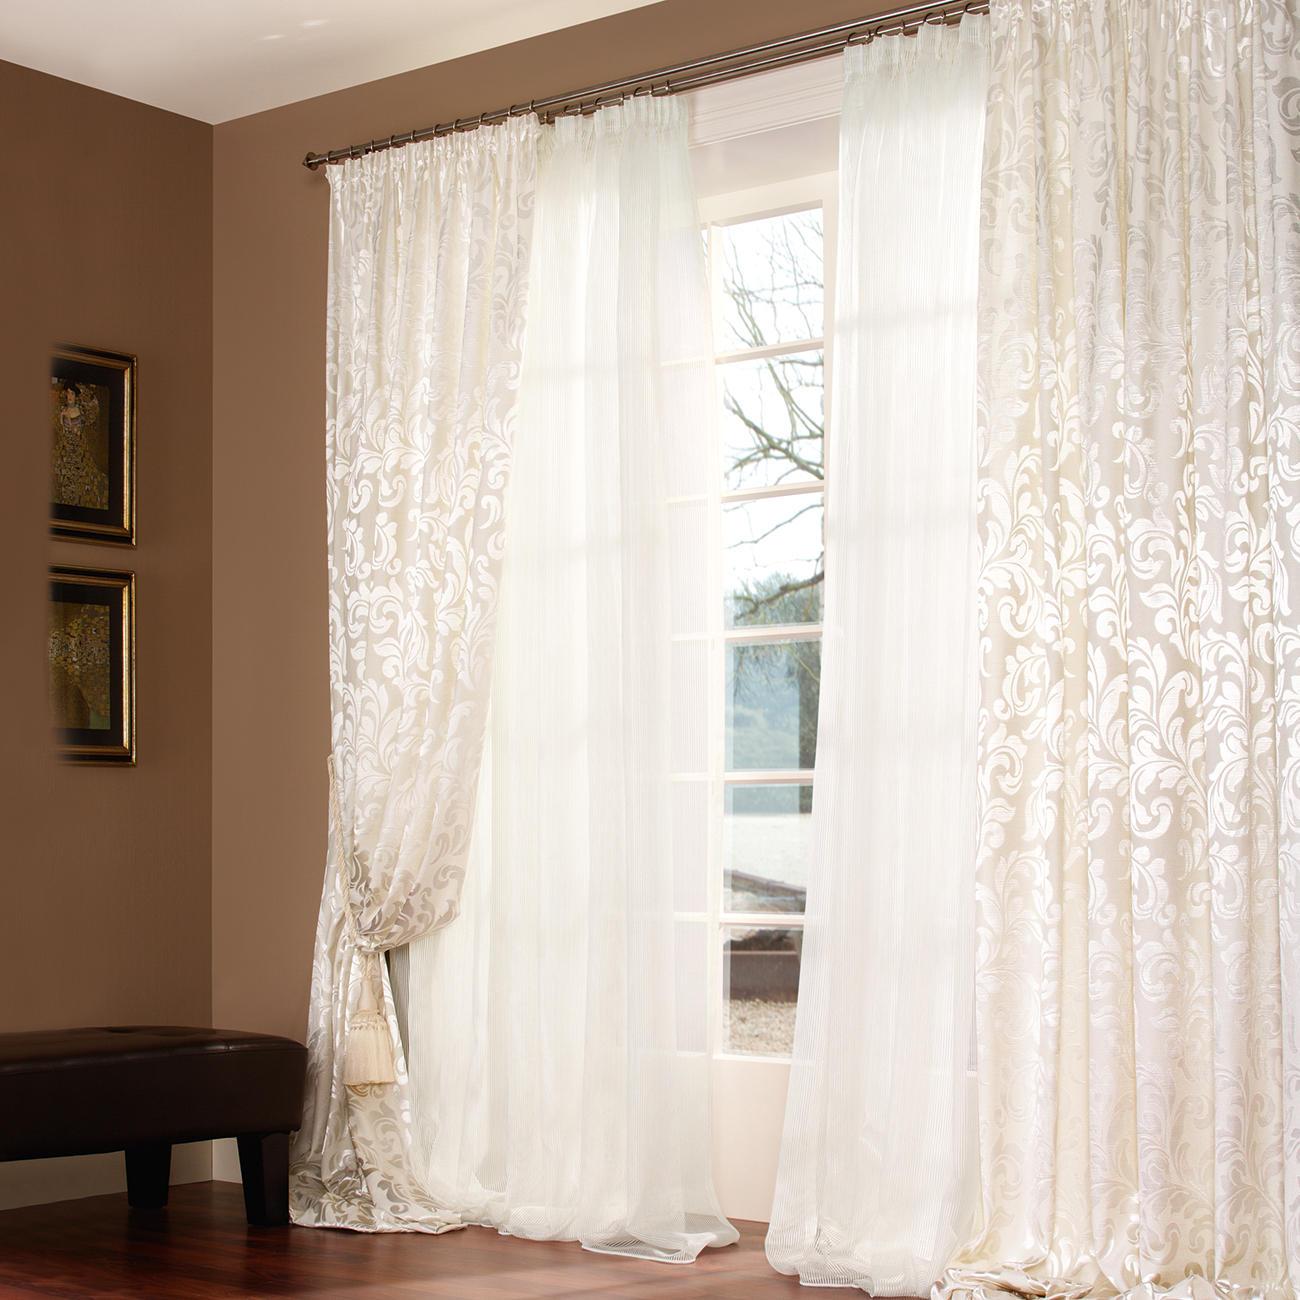 joop gardinen outlet great blickdichte gardinen outlet dining room with joop gardinen outlet. Black Bedroom Furniture Sets. Home Design Ideas